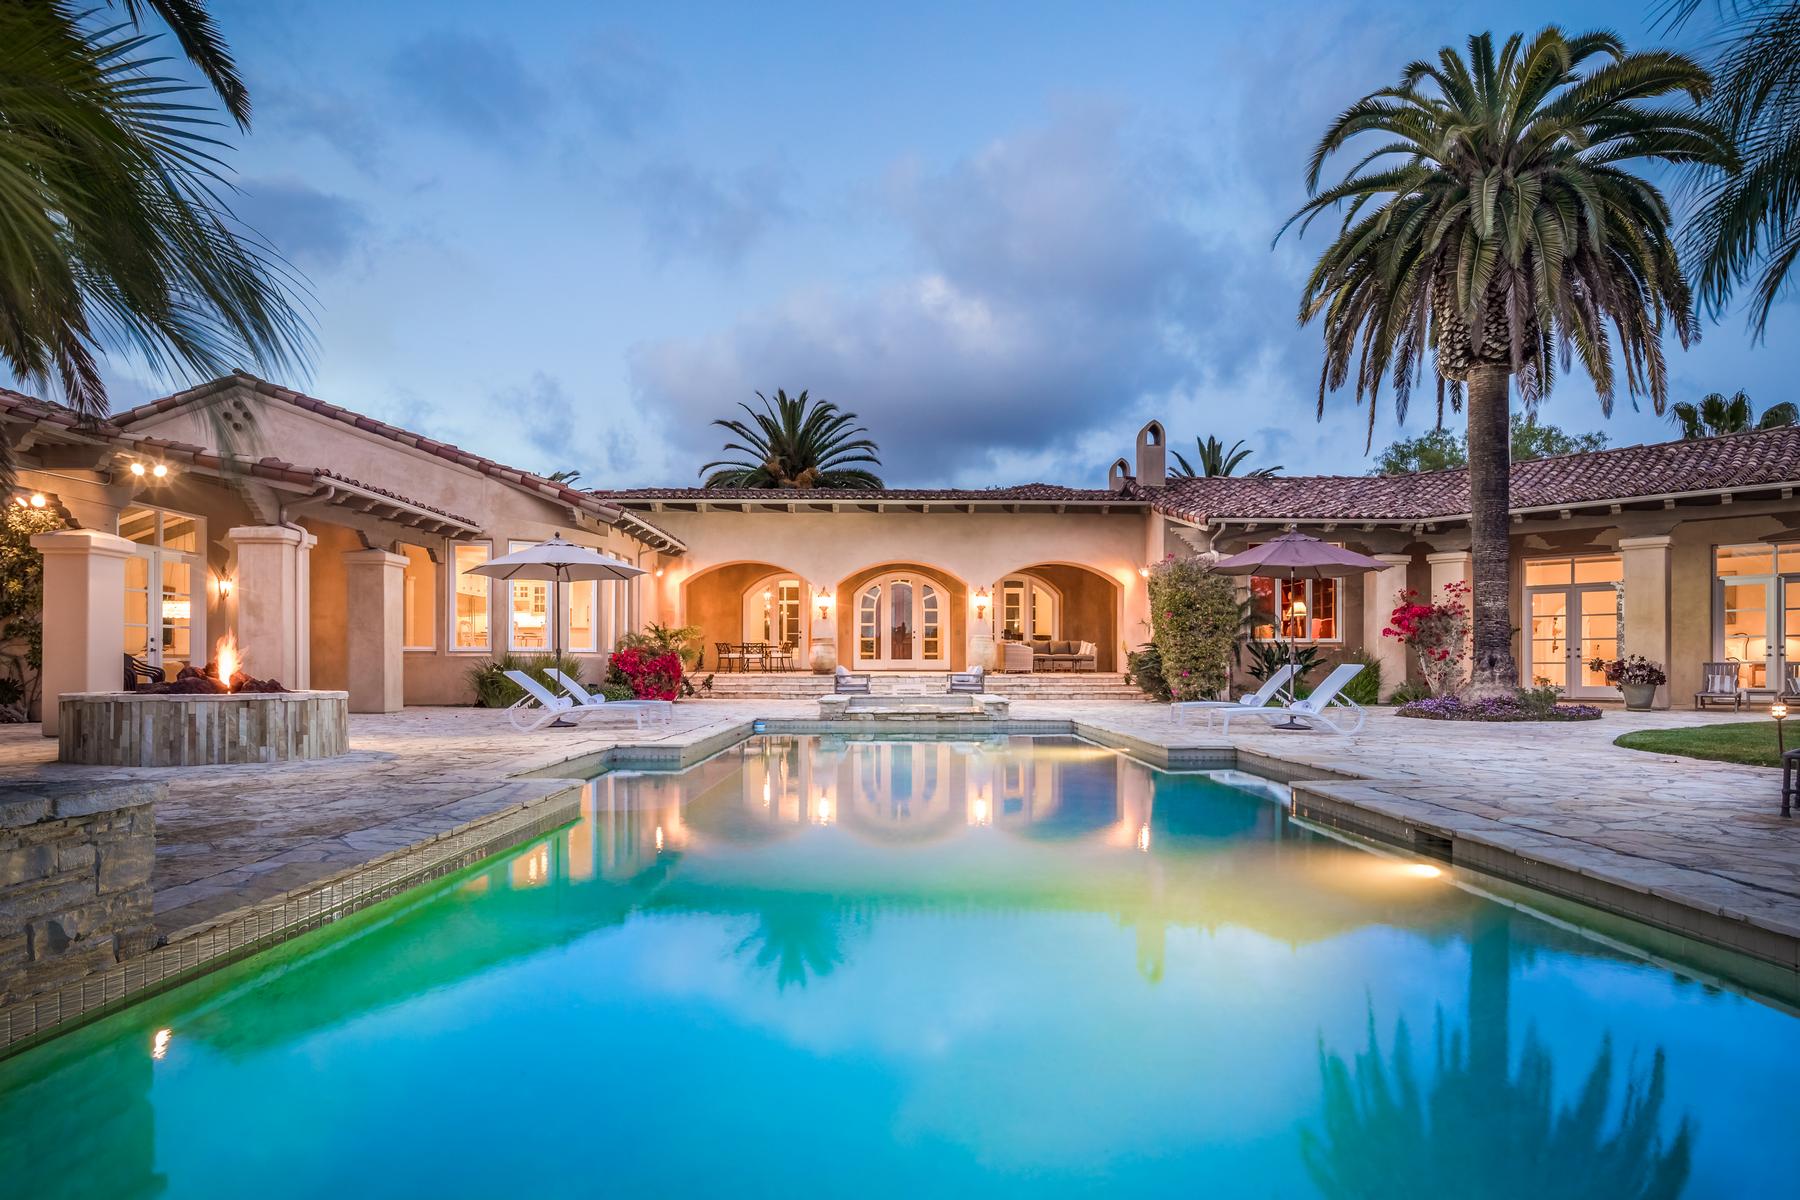 Single Family Home for Sale at 17262 Via Recanto Rancho Santa Fe, California, 92067 United States